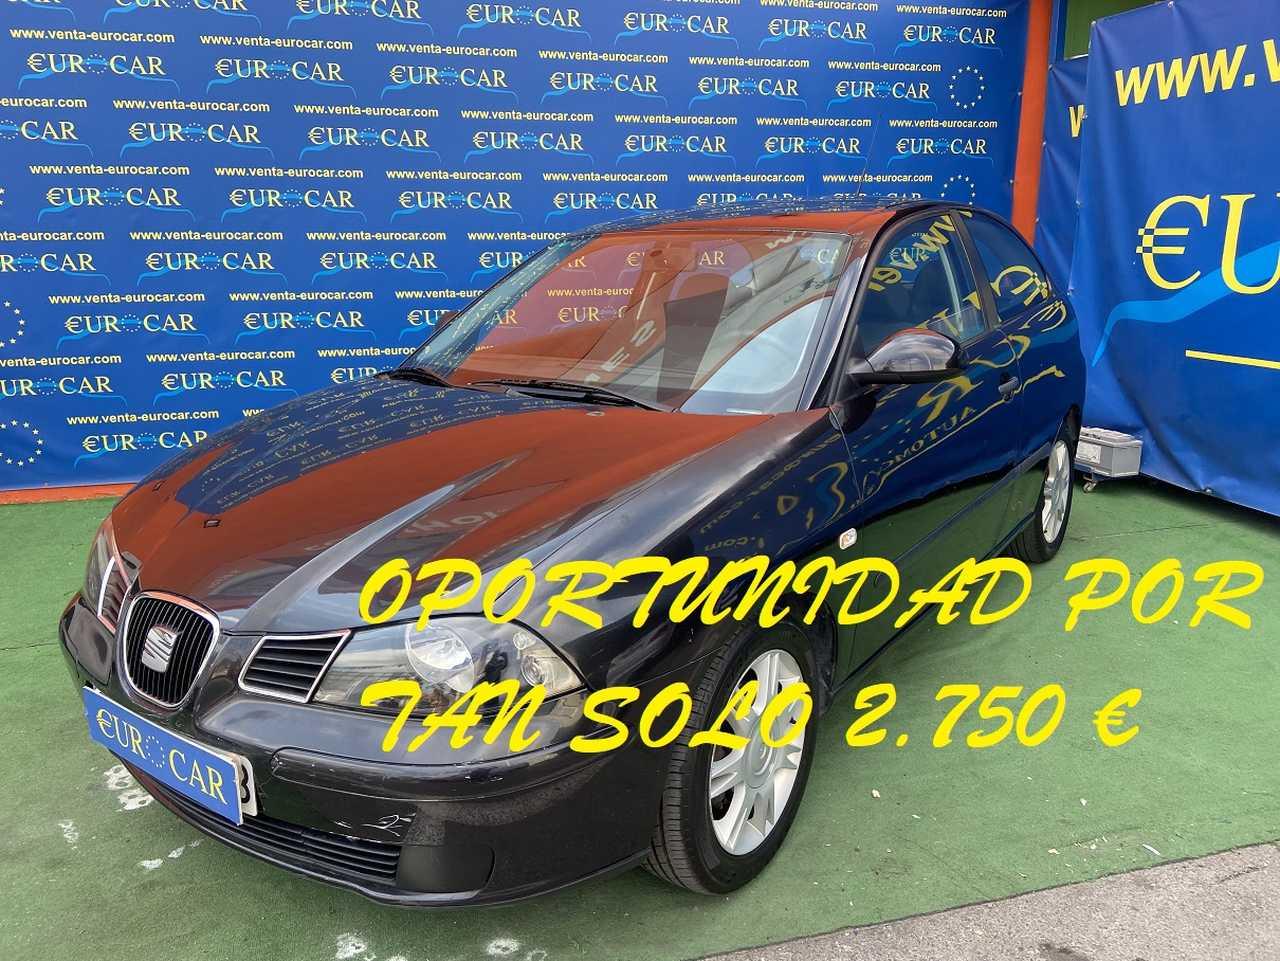 Seat Ibiza 1.4 I   - Foto 1